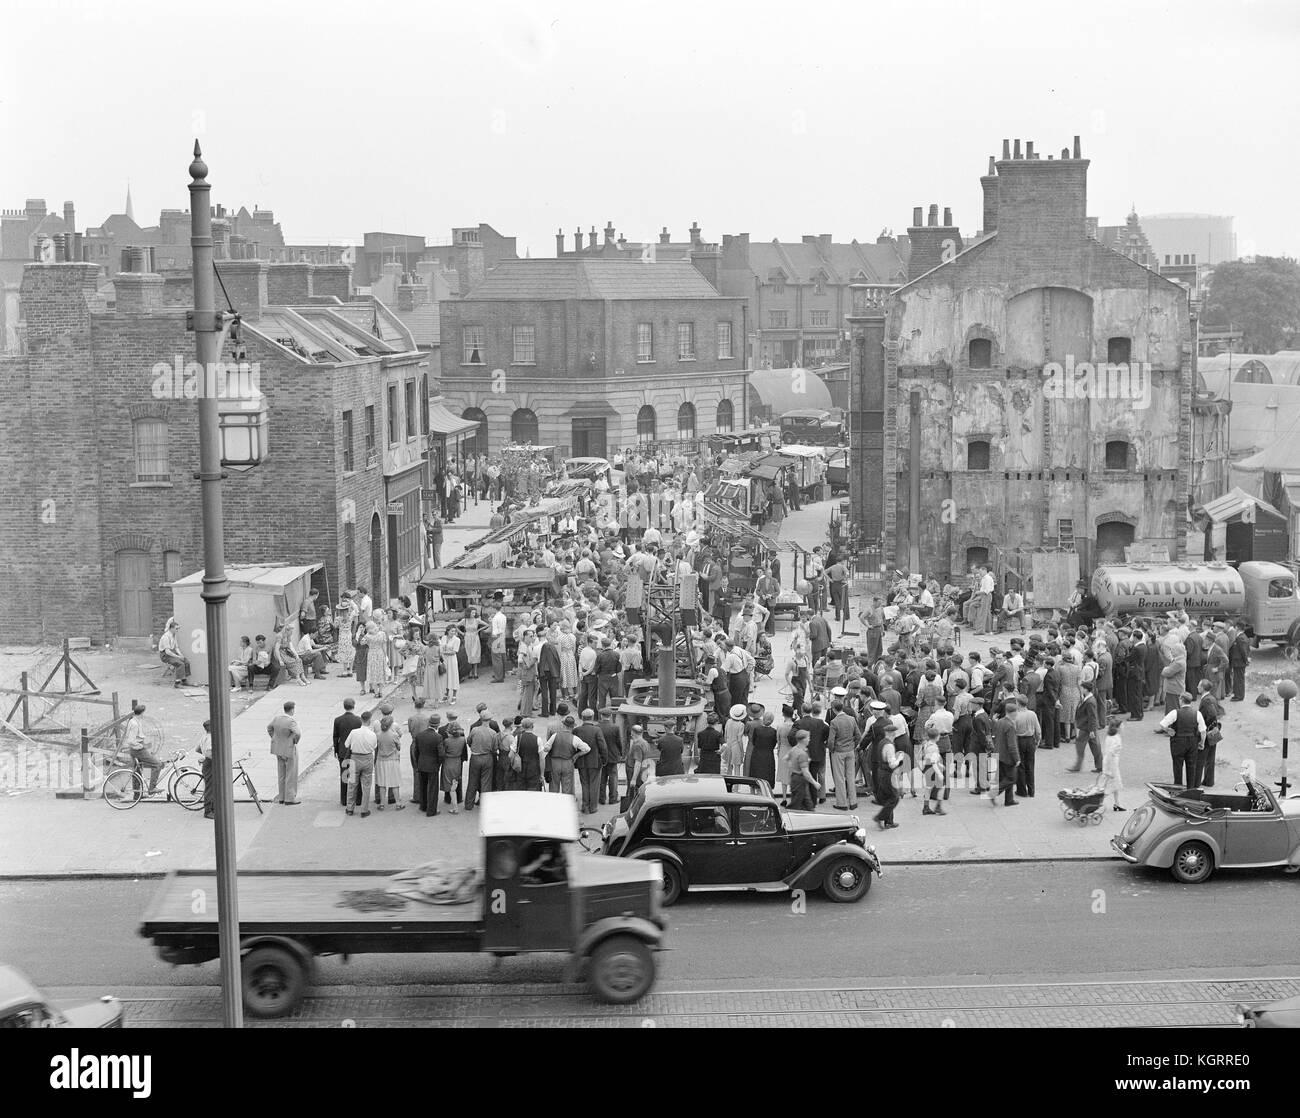 Passport to Pimlico film (1949) - Stock Image